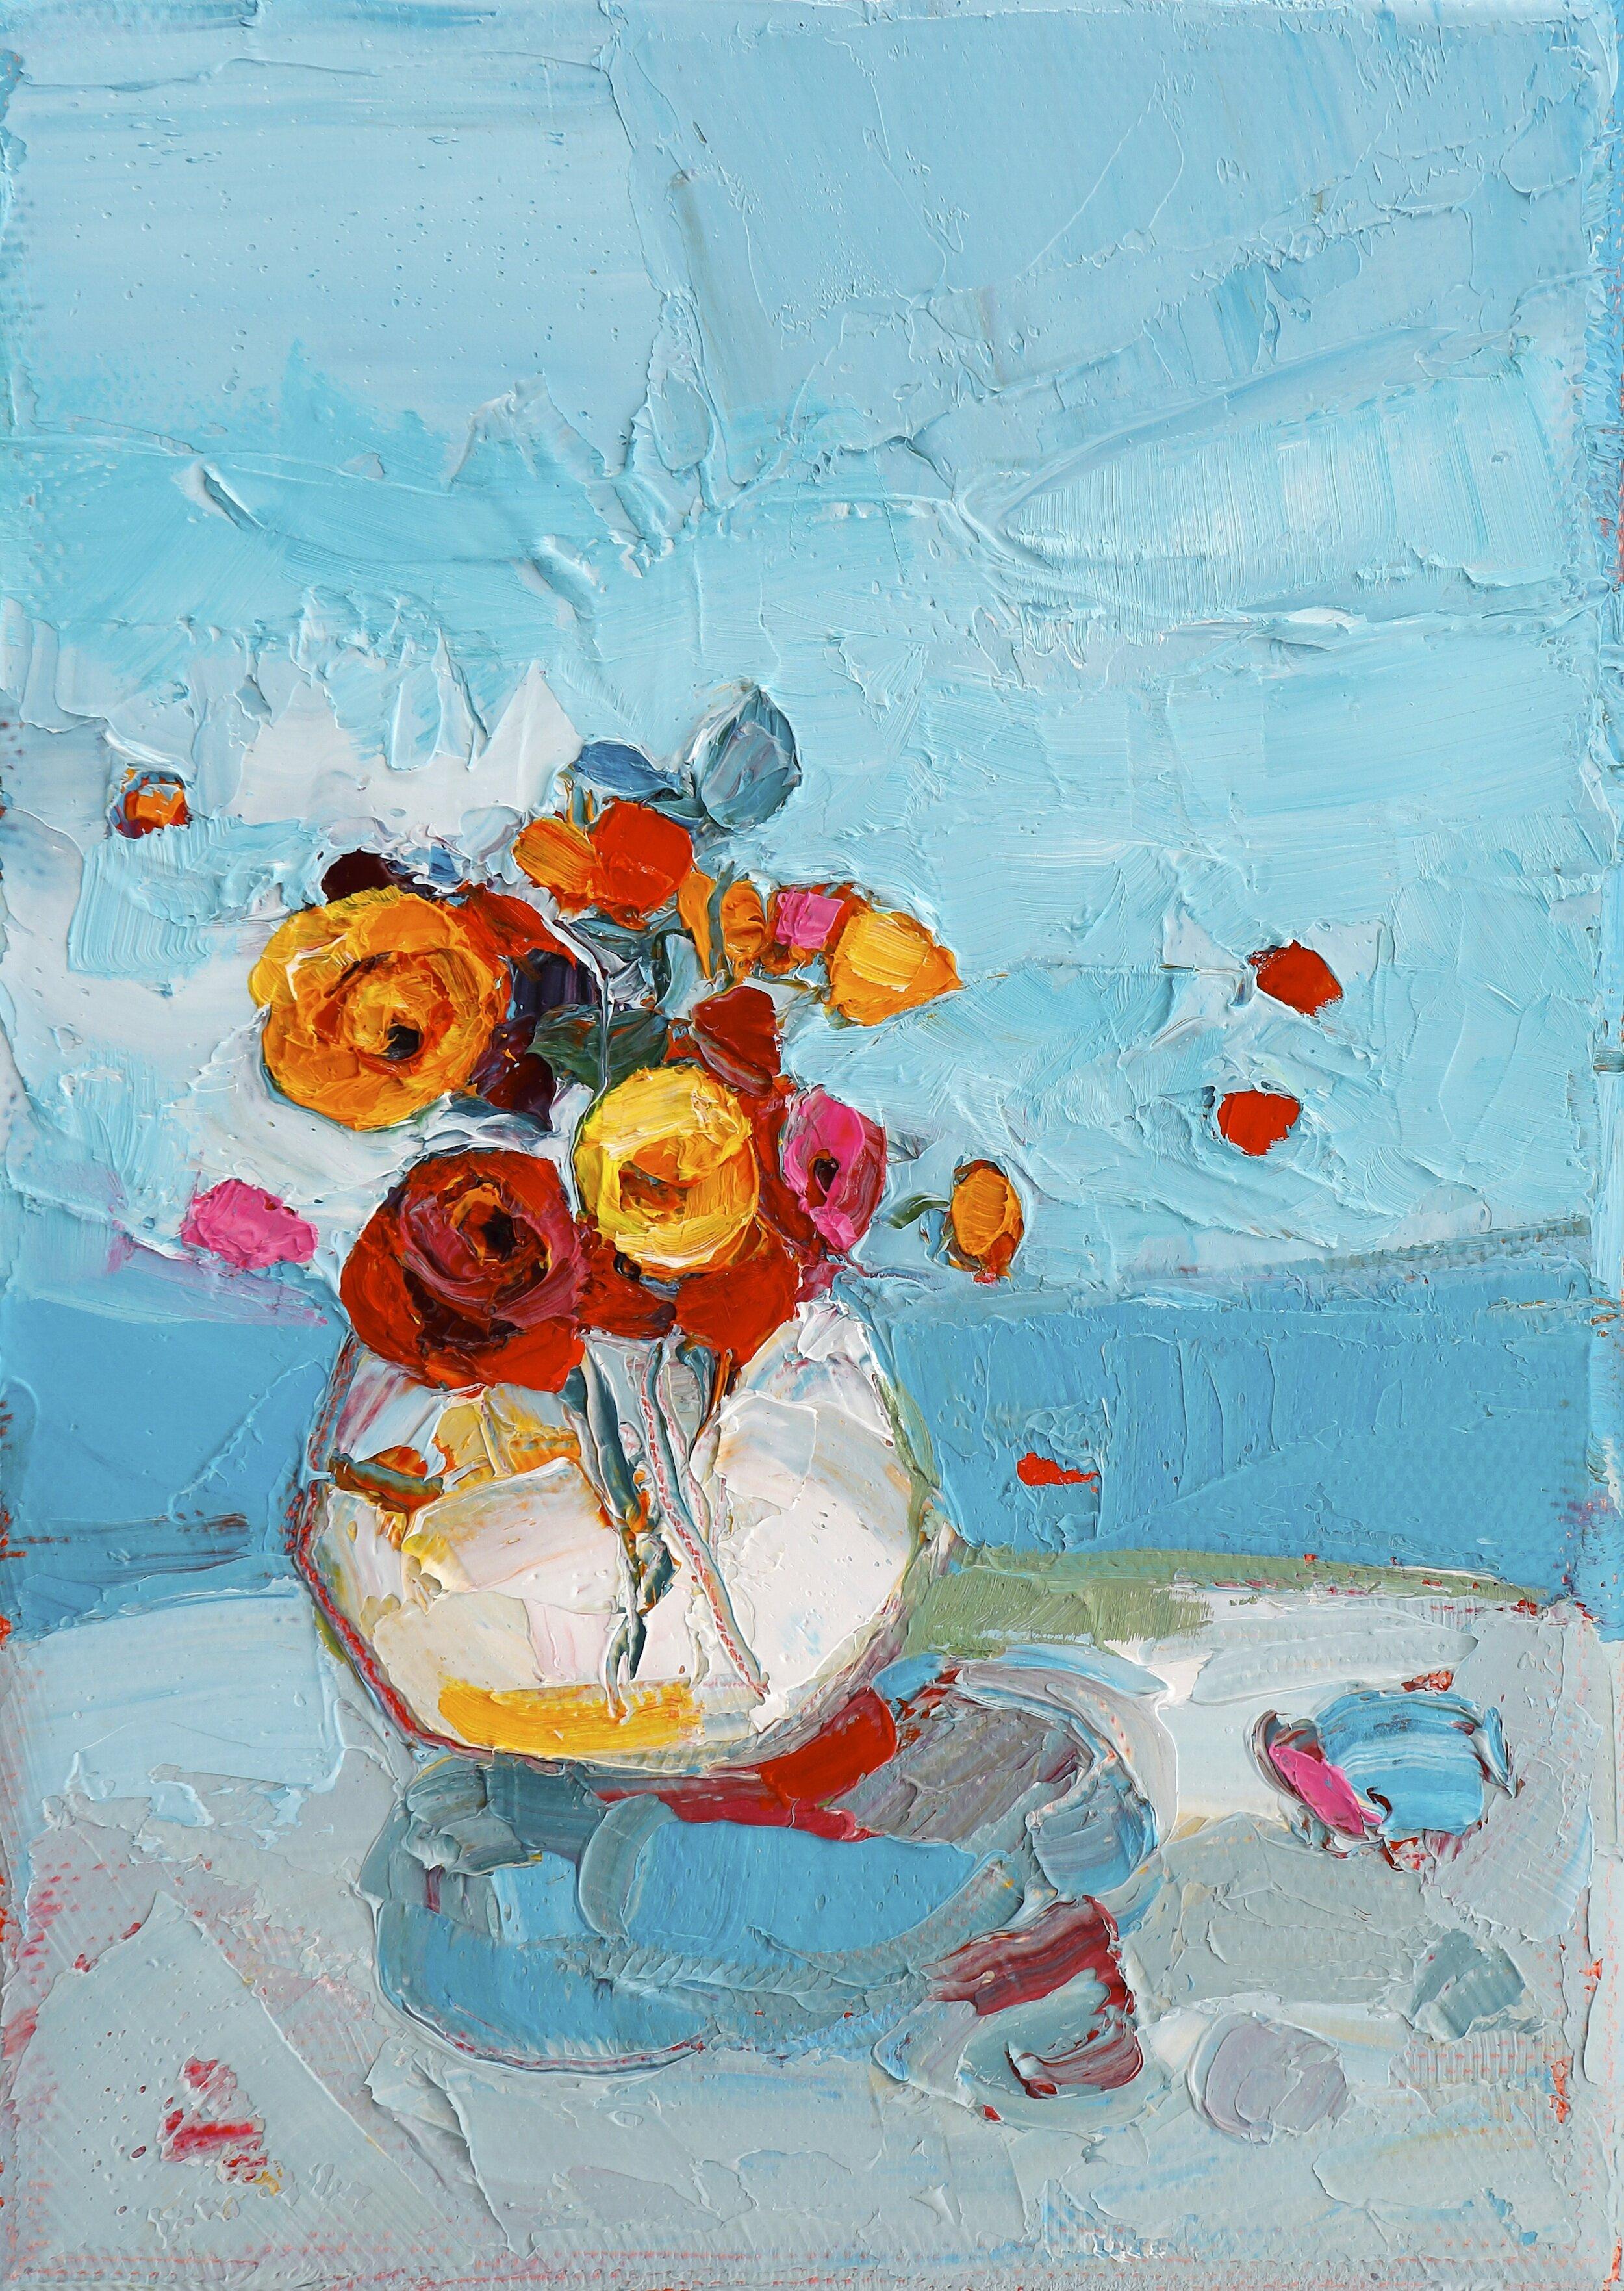 Title: Mini Celebration  Size: 7x5in  Medium: Oil on Canvas  Price: £650